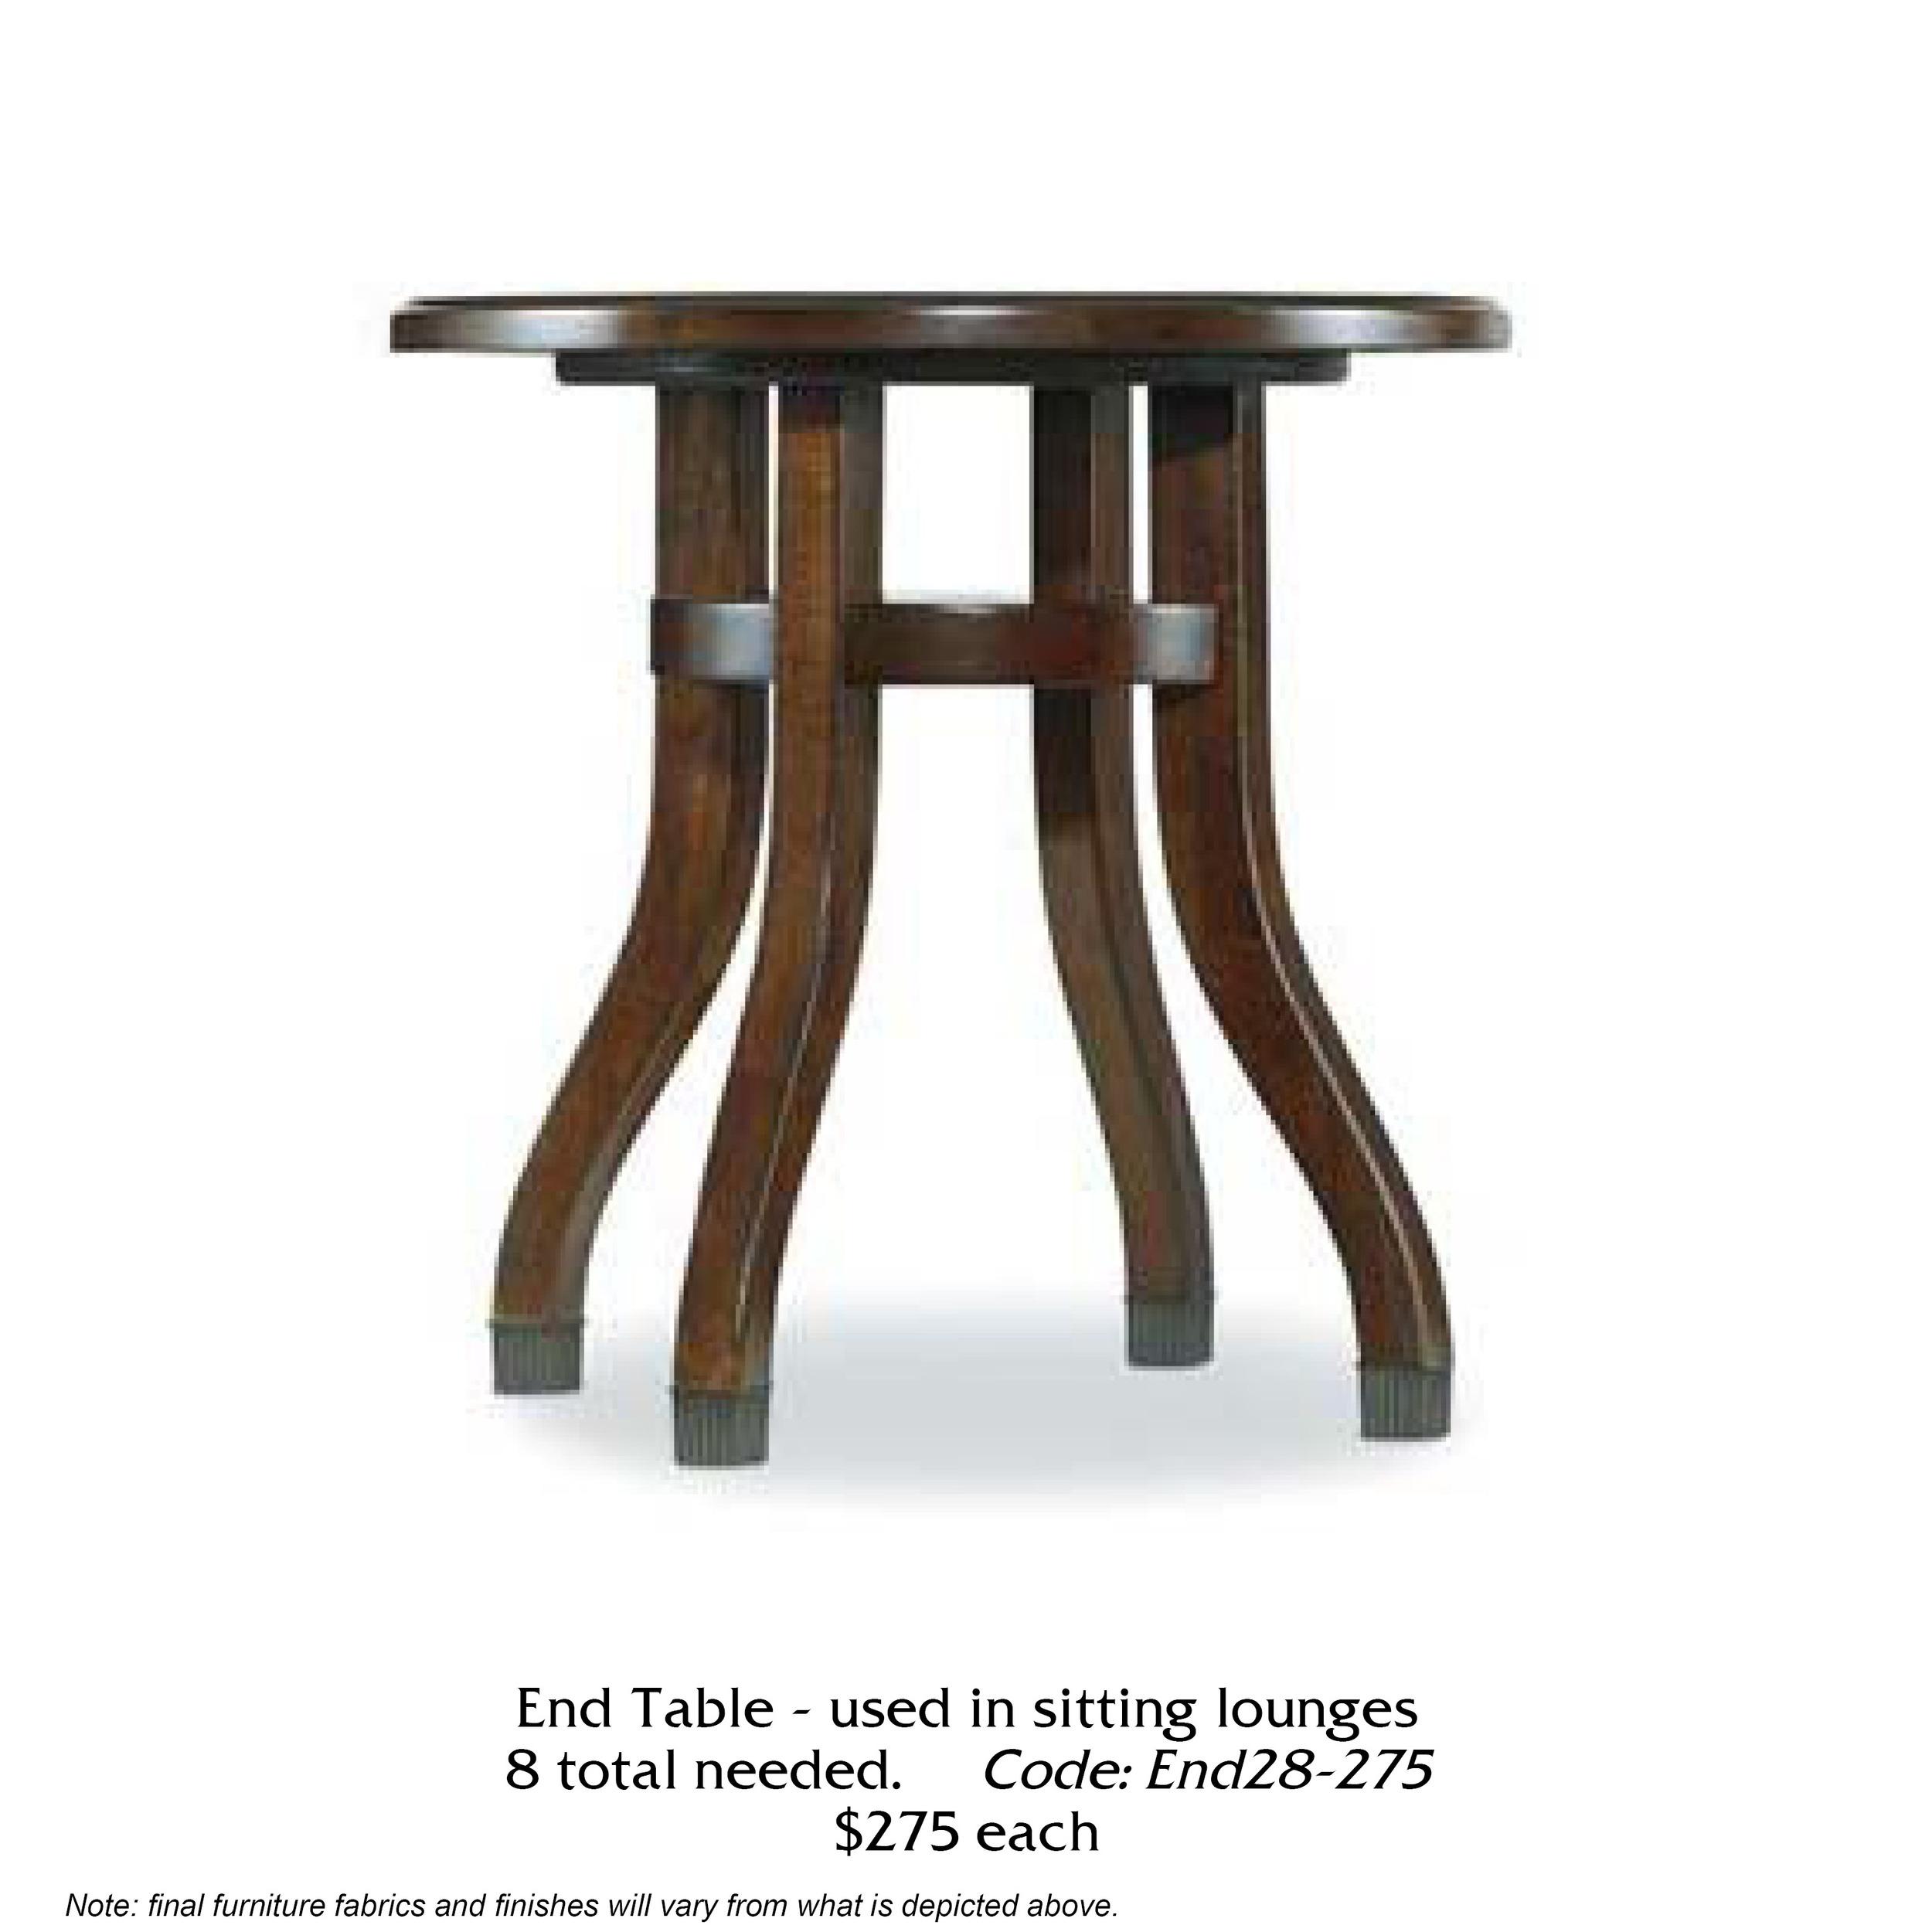 A112-F7-A141-F28-B114-F62-B152-F94-End Table - 2-2-2-2.jpg